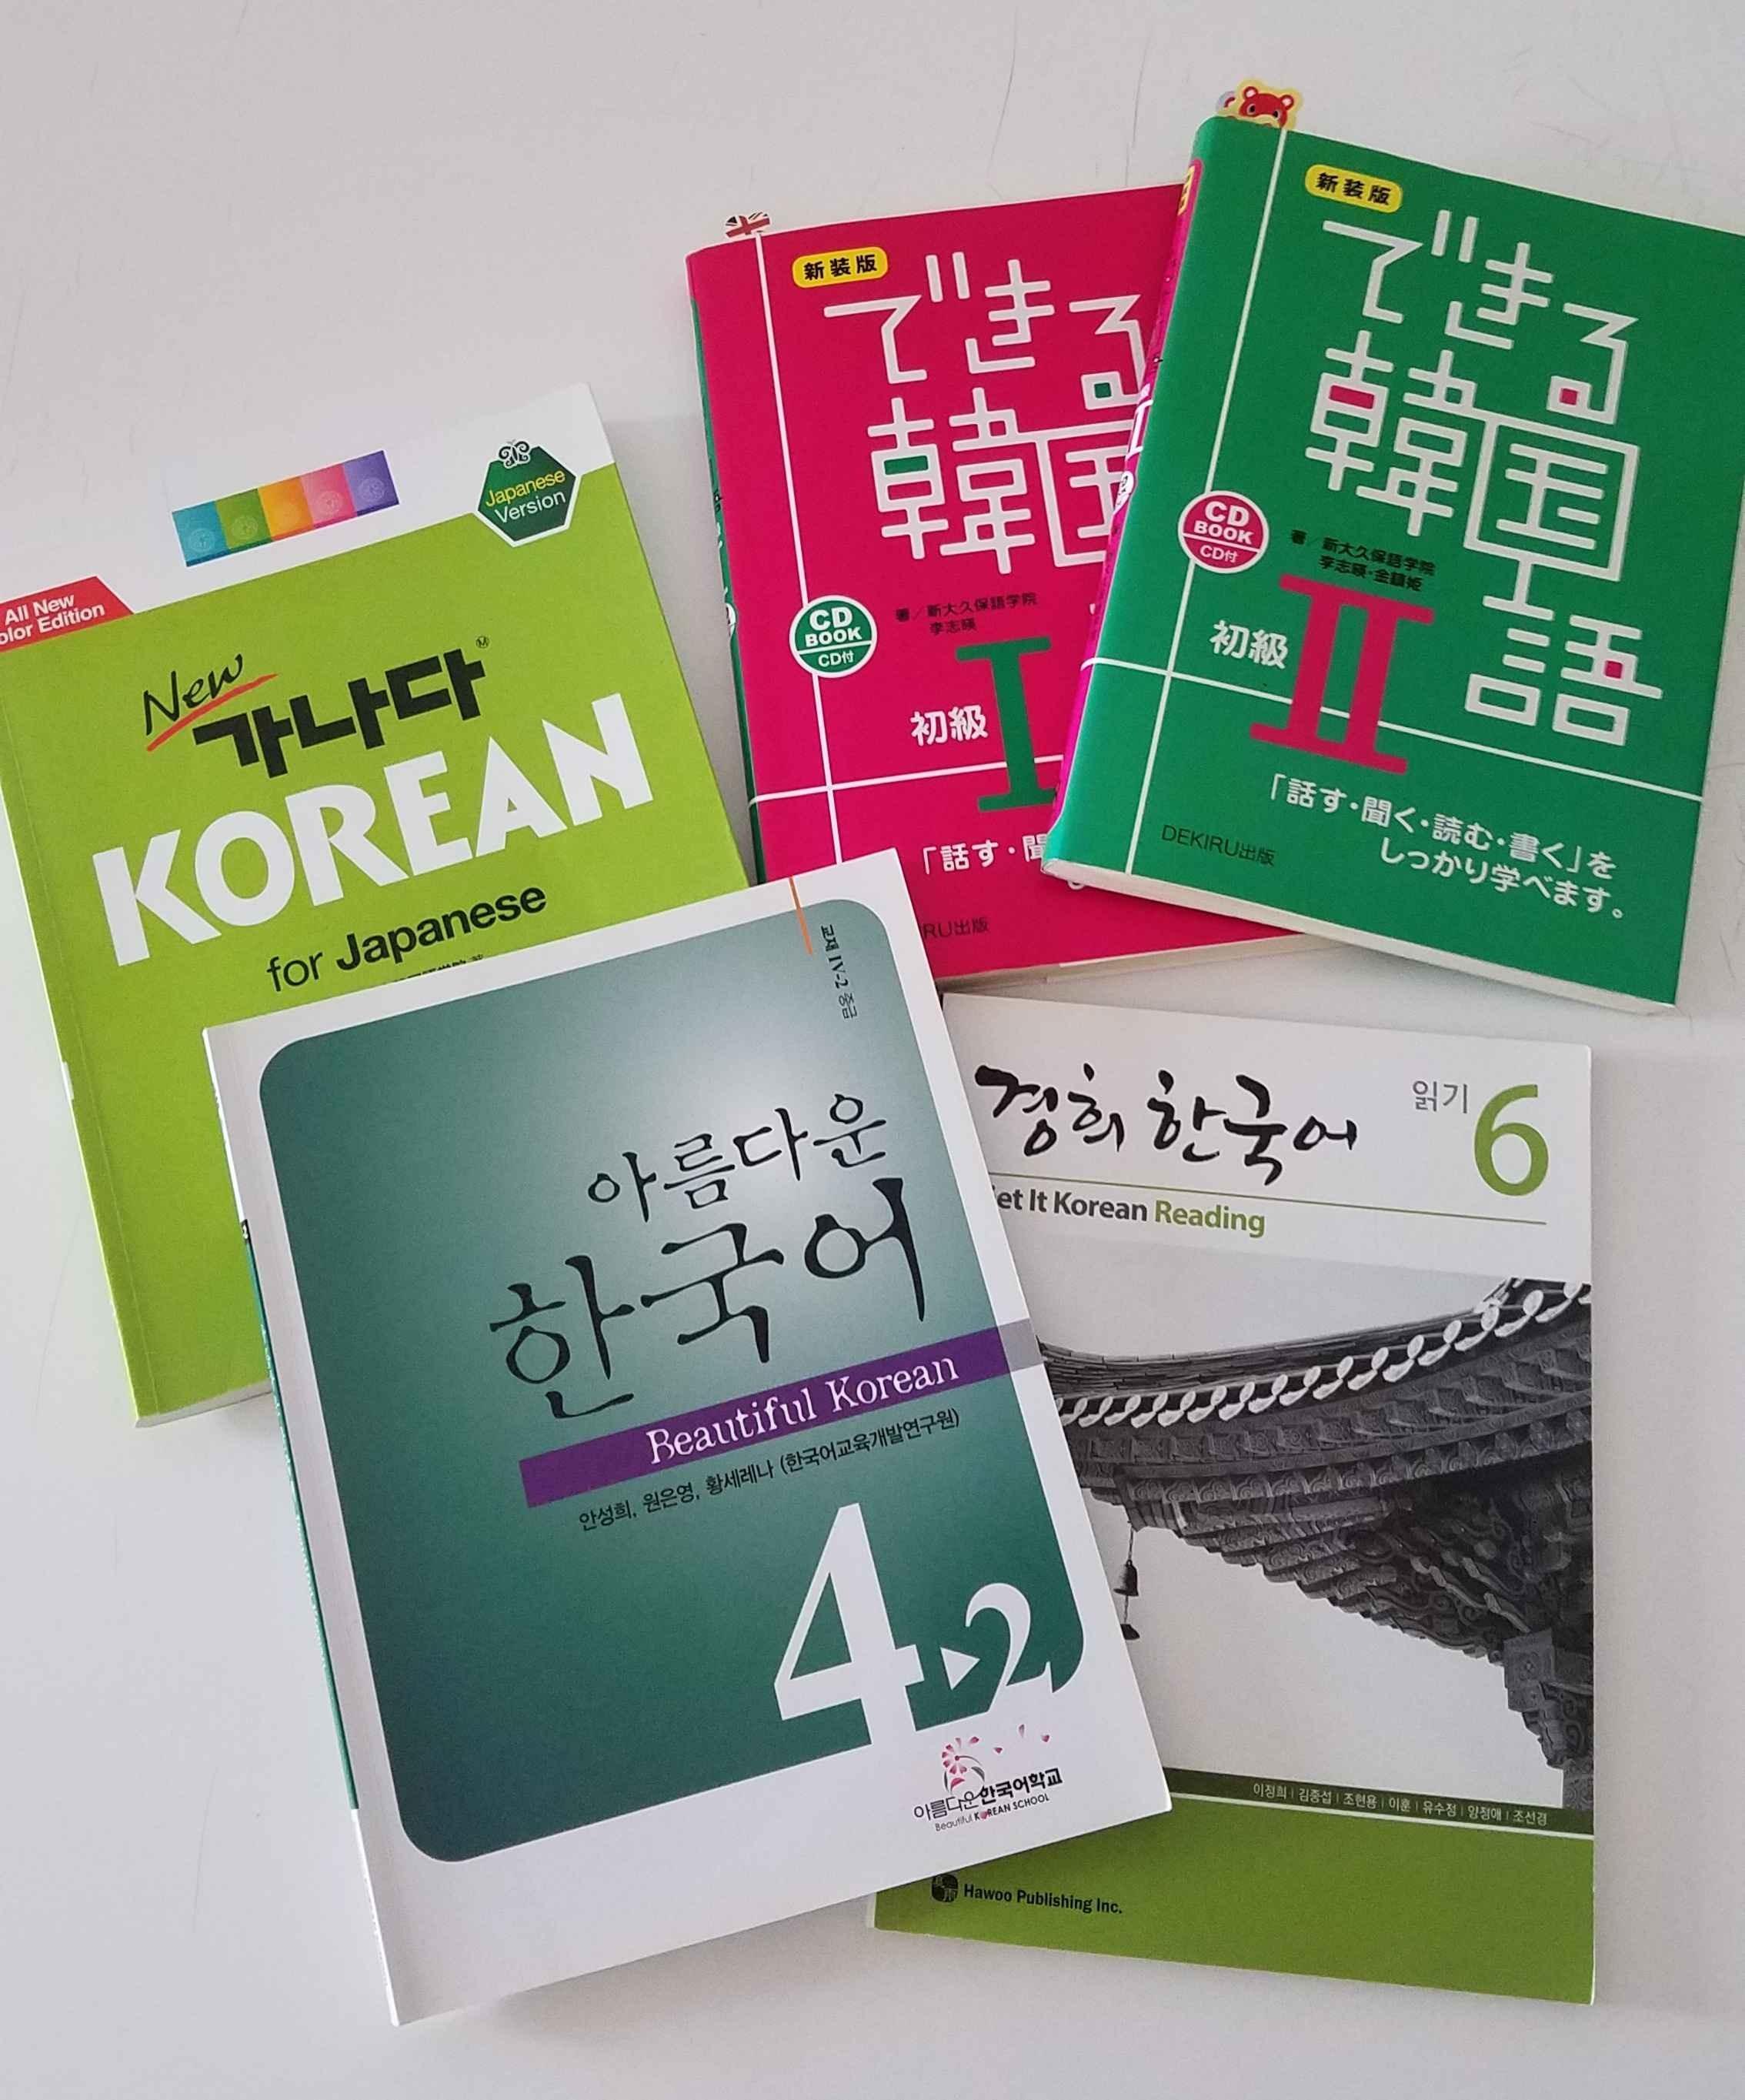 埼玉 女性限定 ハングル 韓国語教室